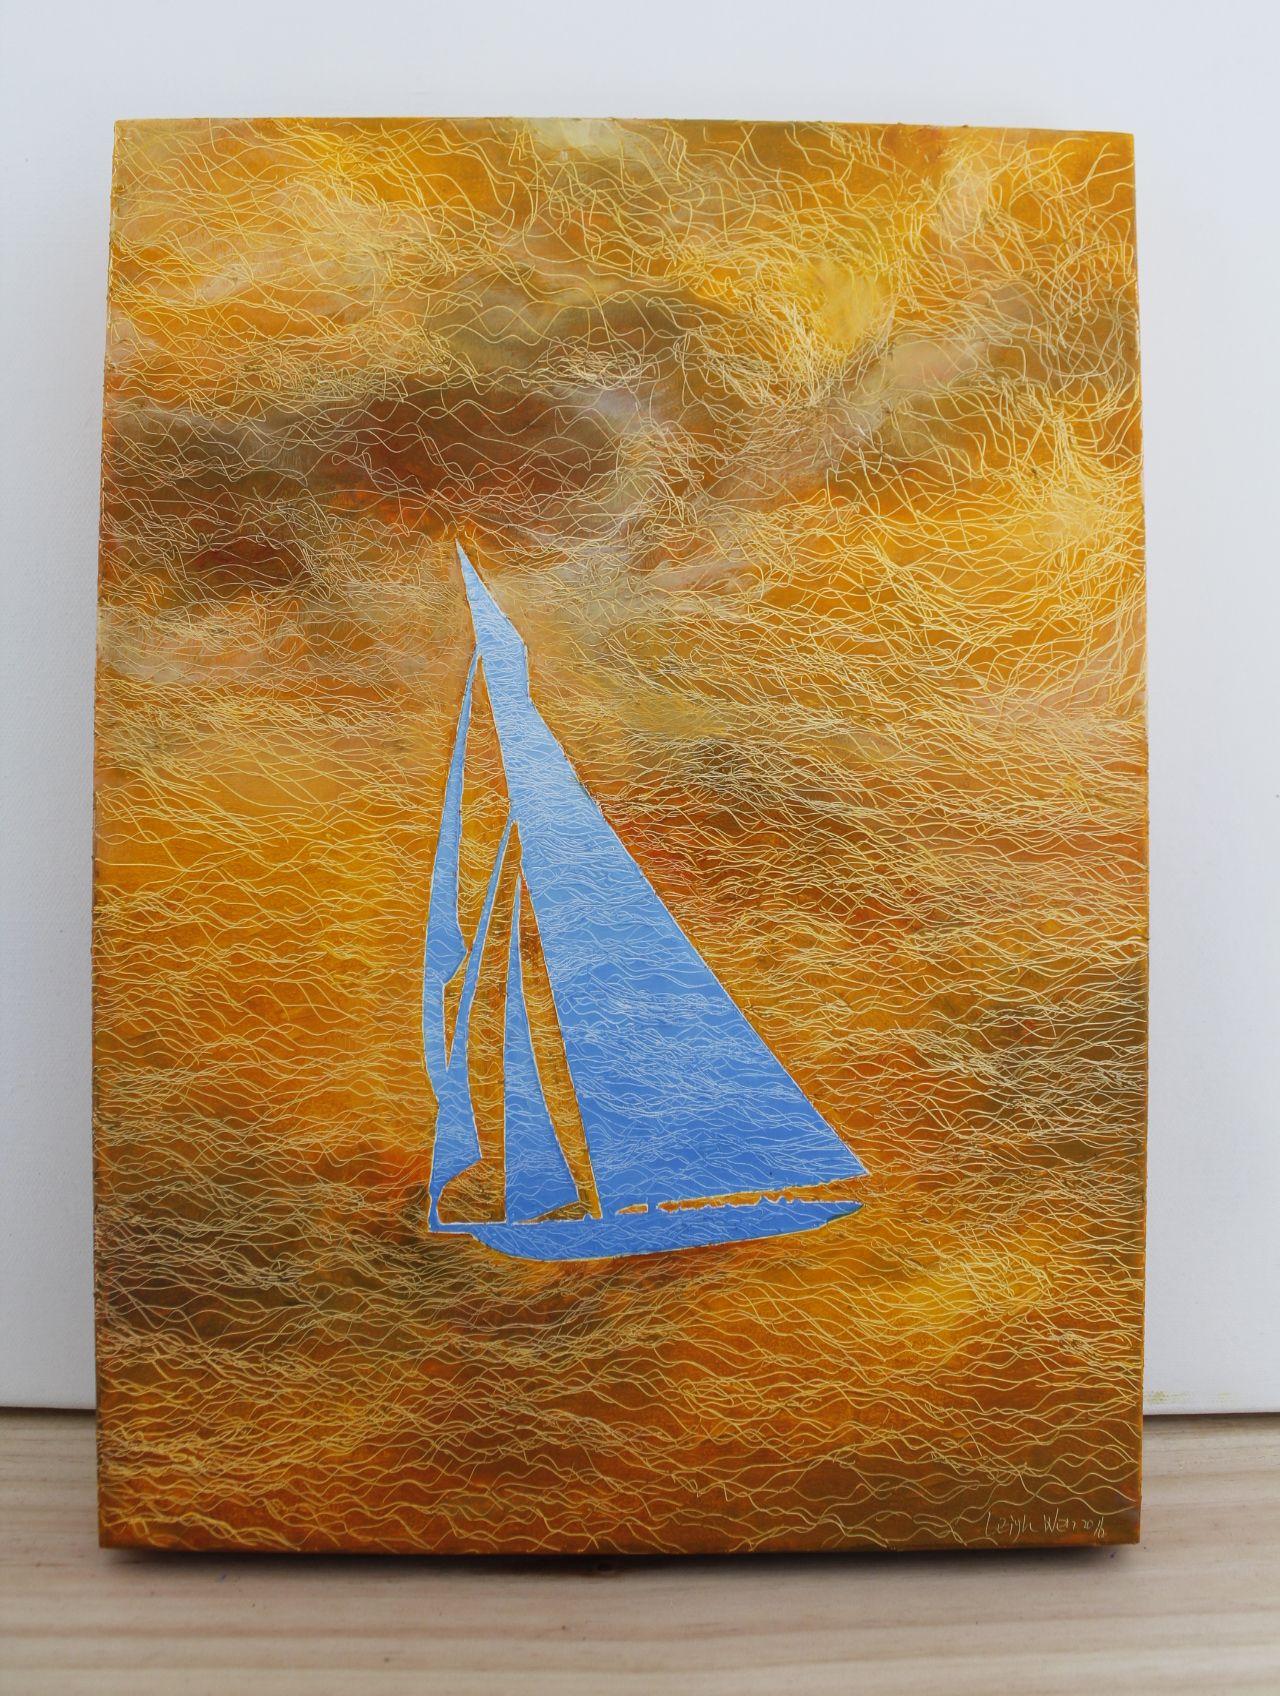 帆行 4, Sail 4, 45 x 33 cm (8P), oil on linen, 2016